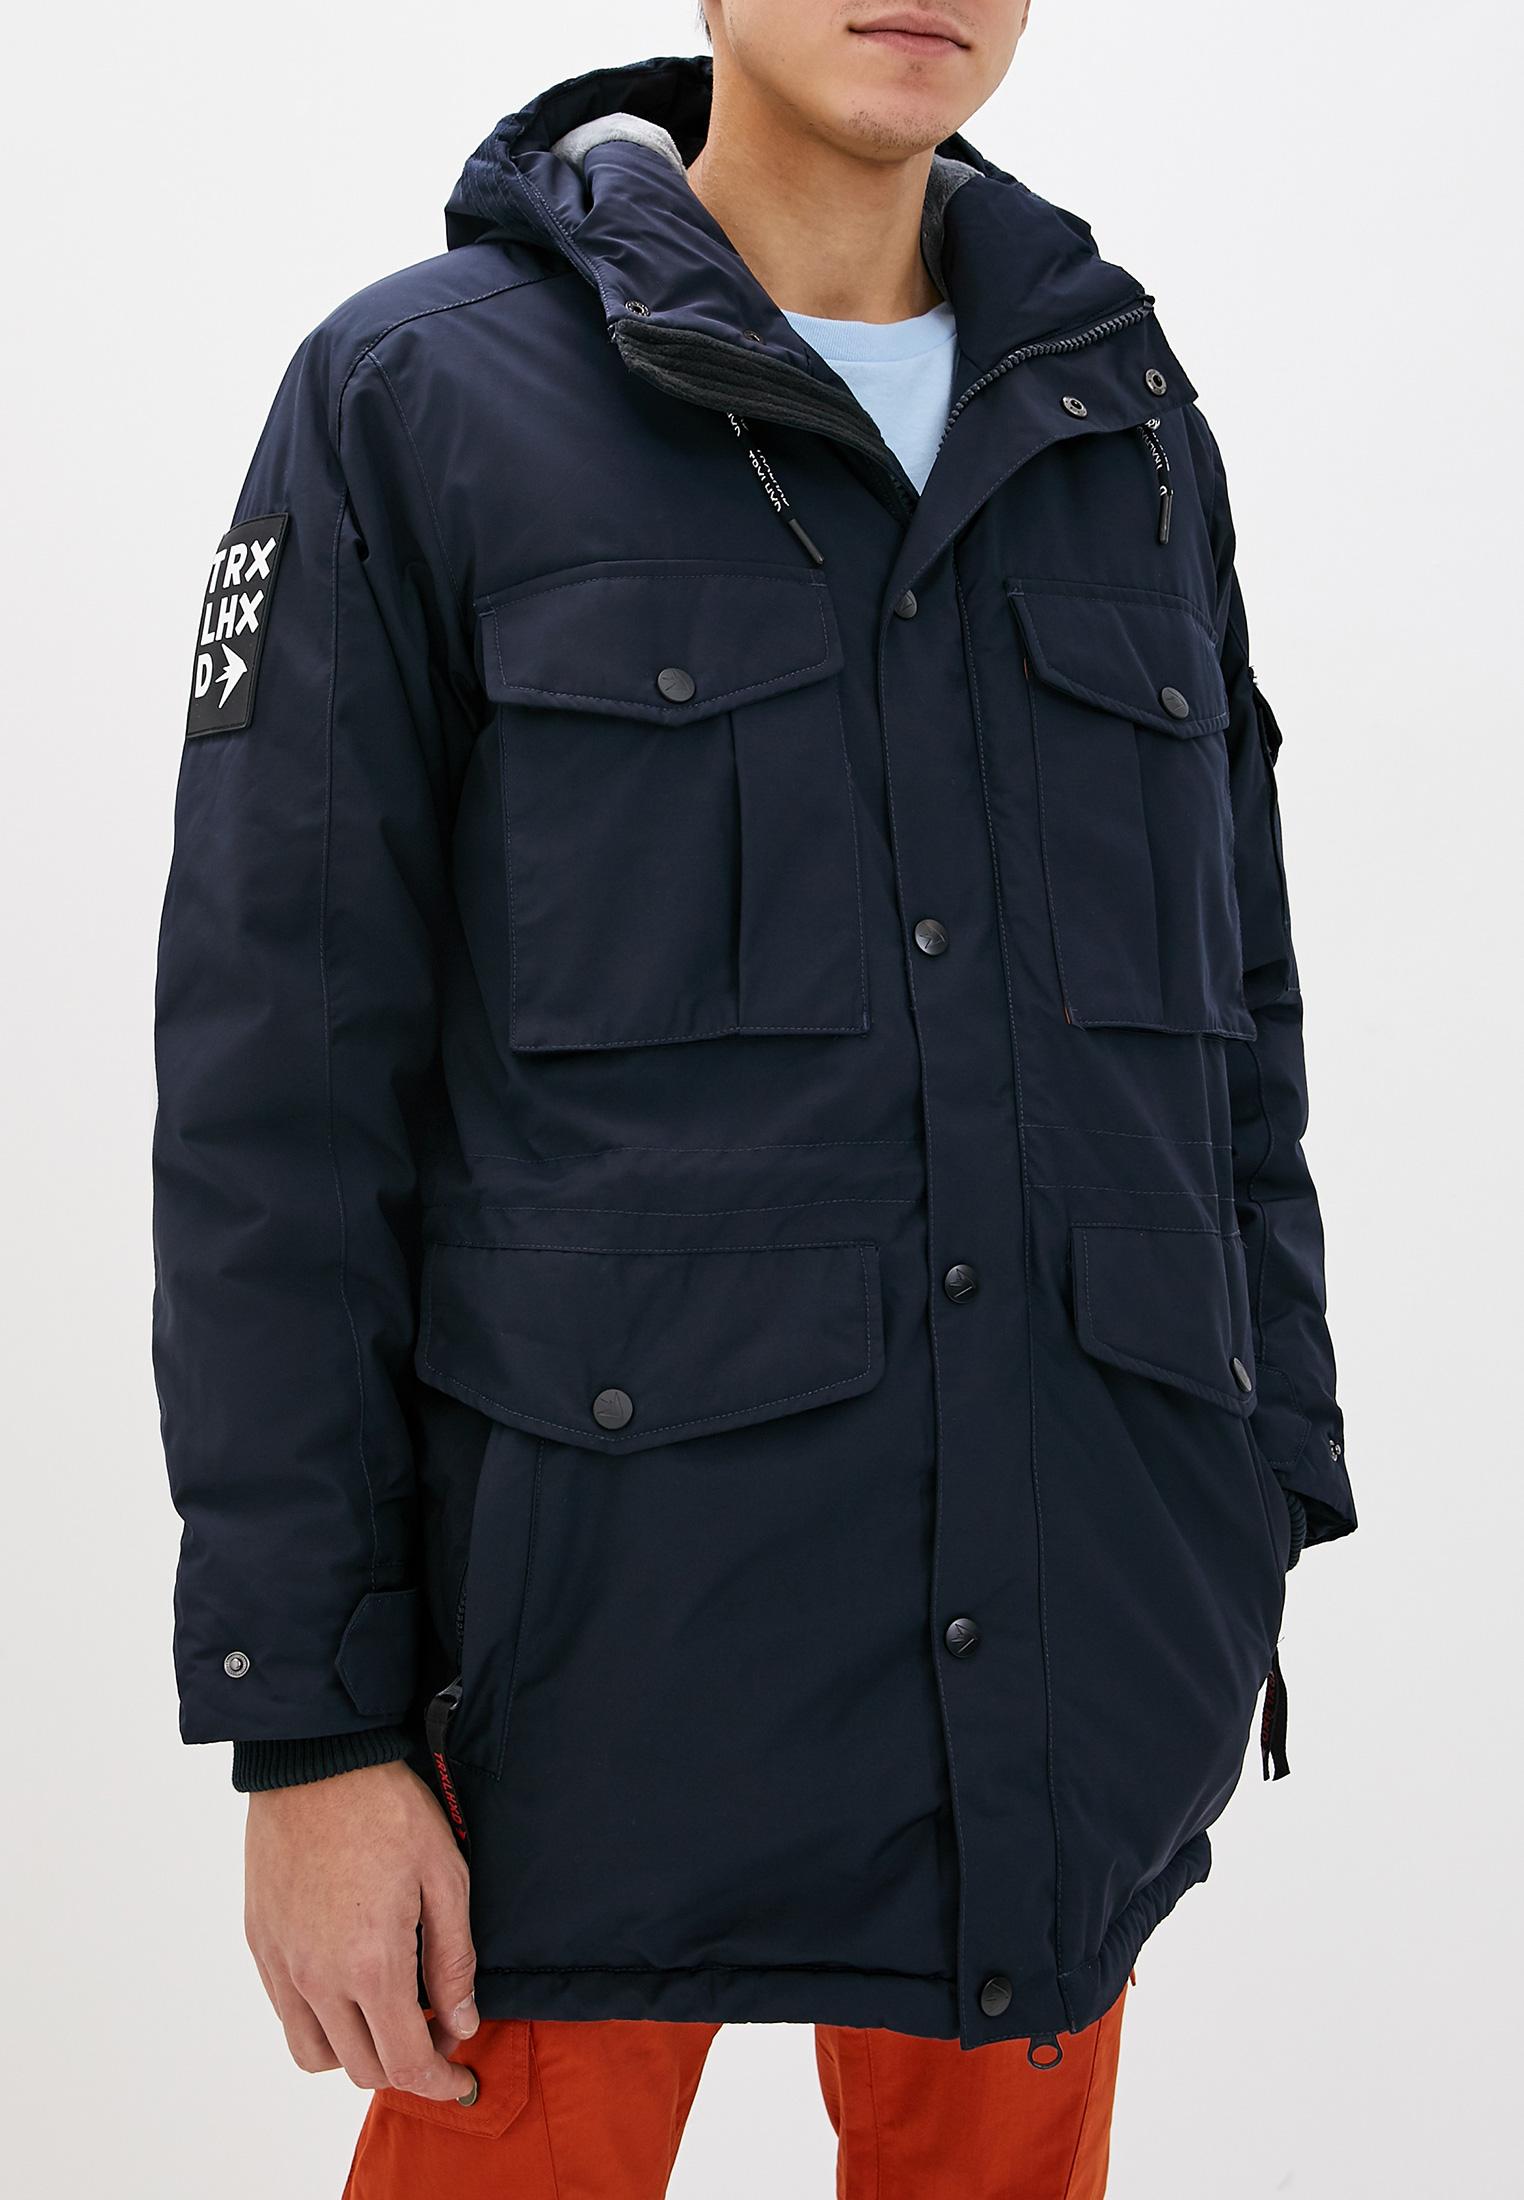 Мужская верхняя одежда Trailhead MJK524